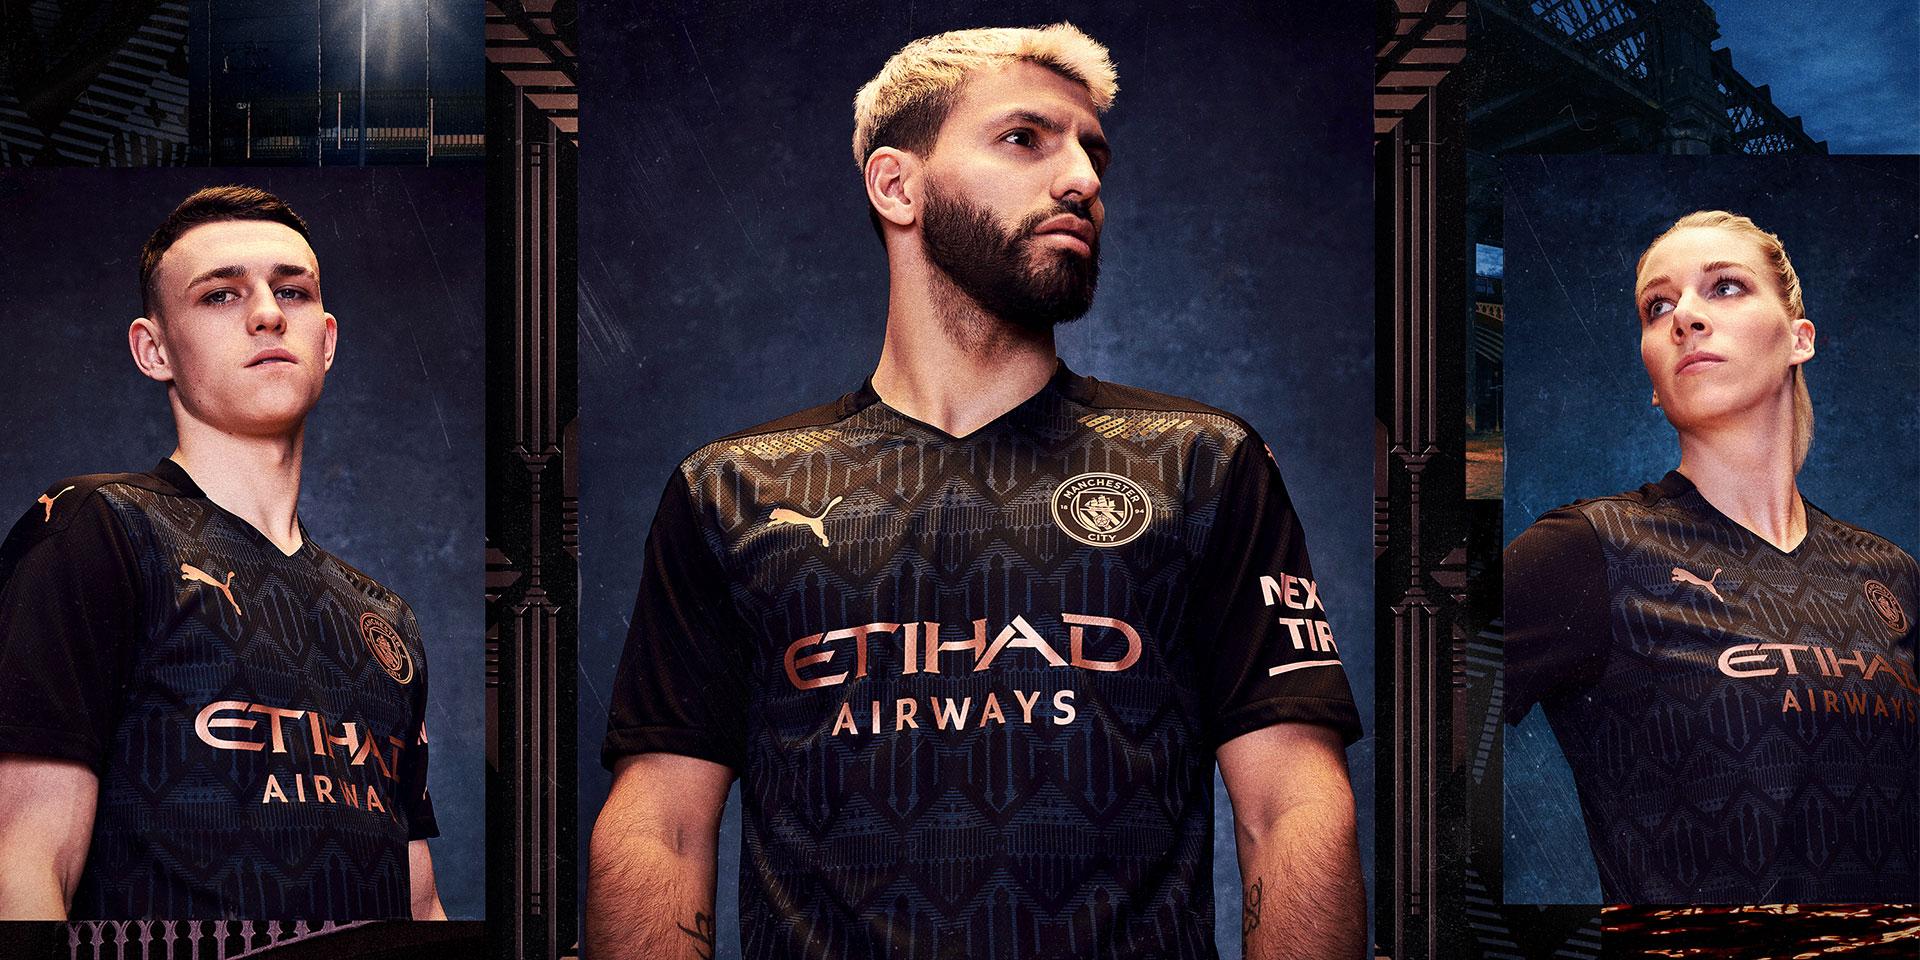 Manchester City Away kit 2020/21